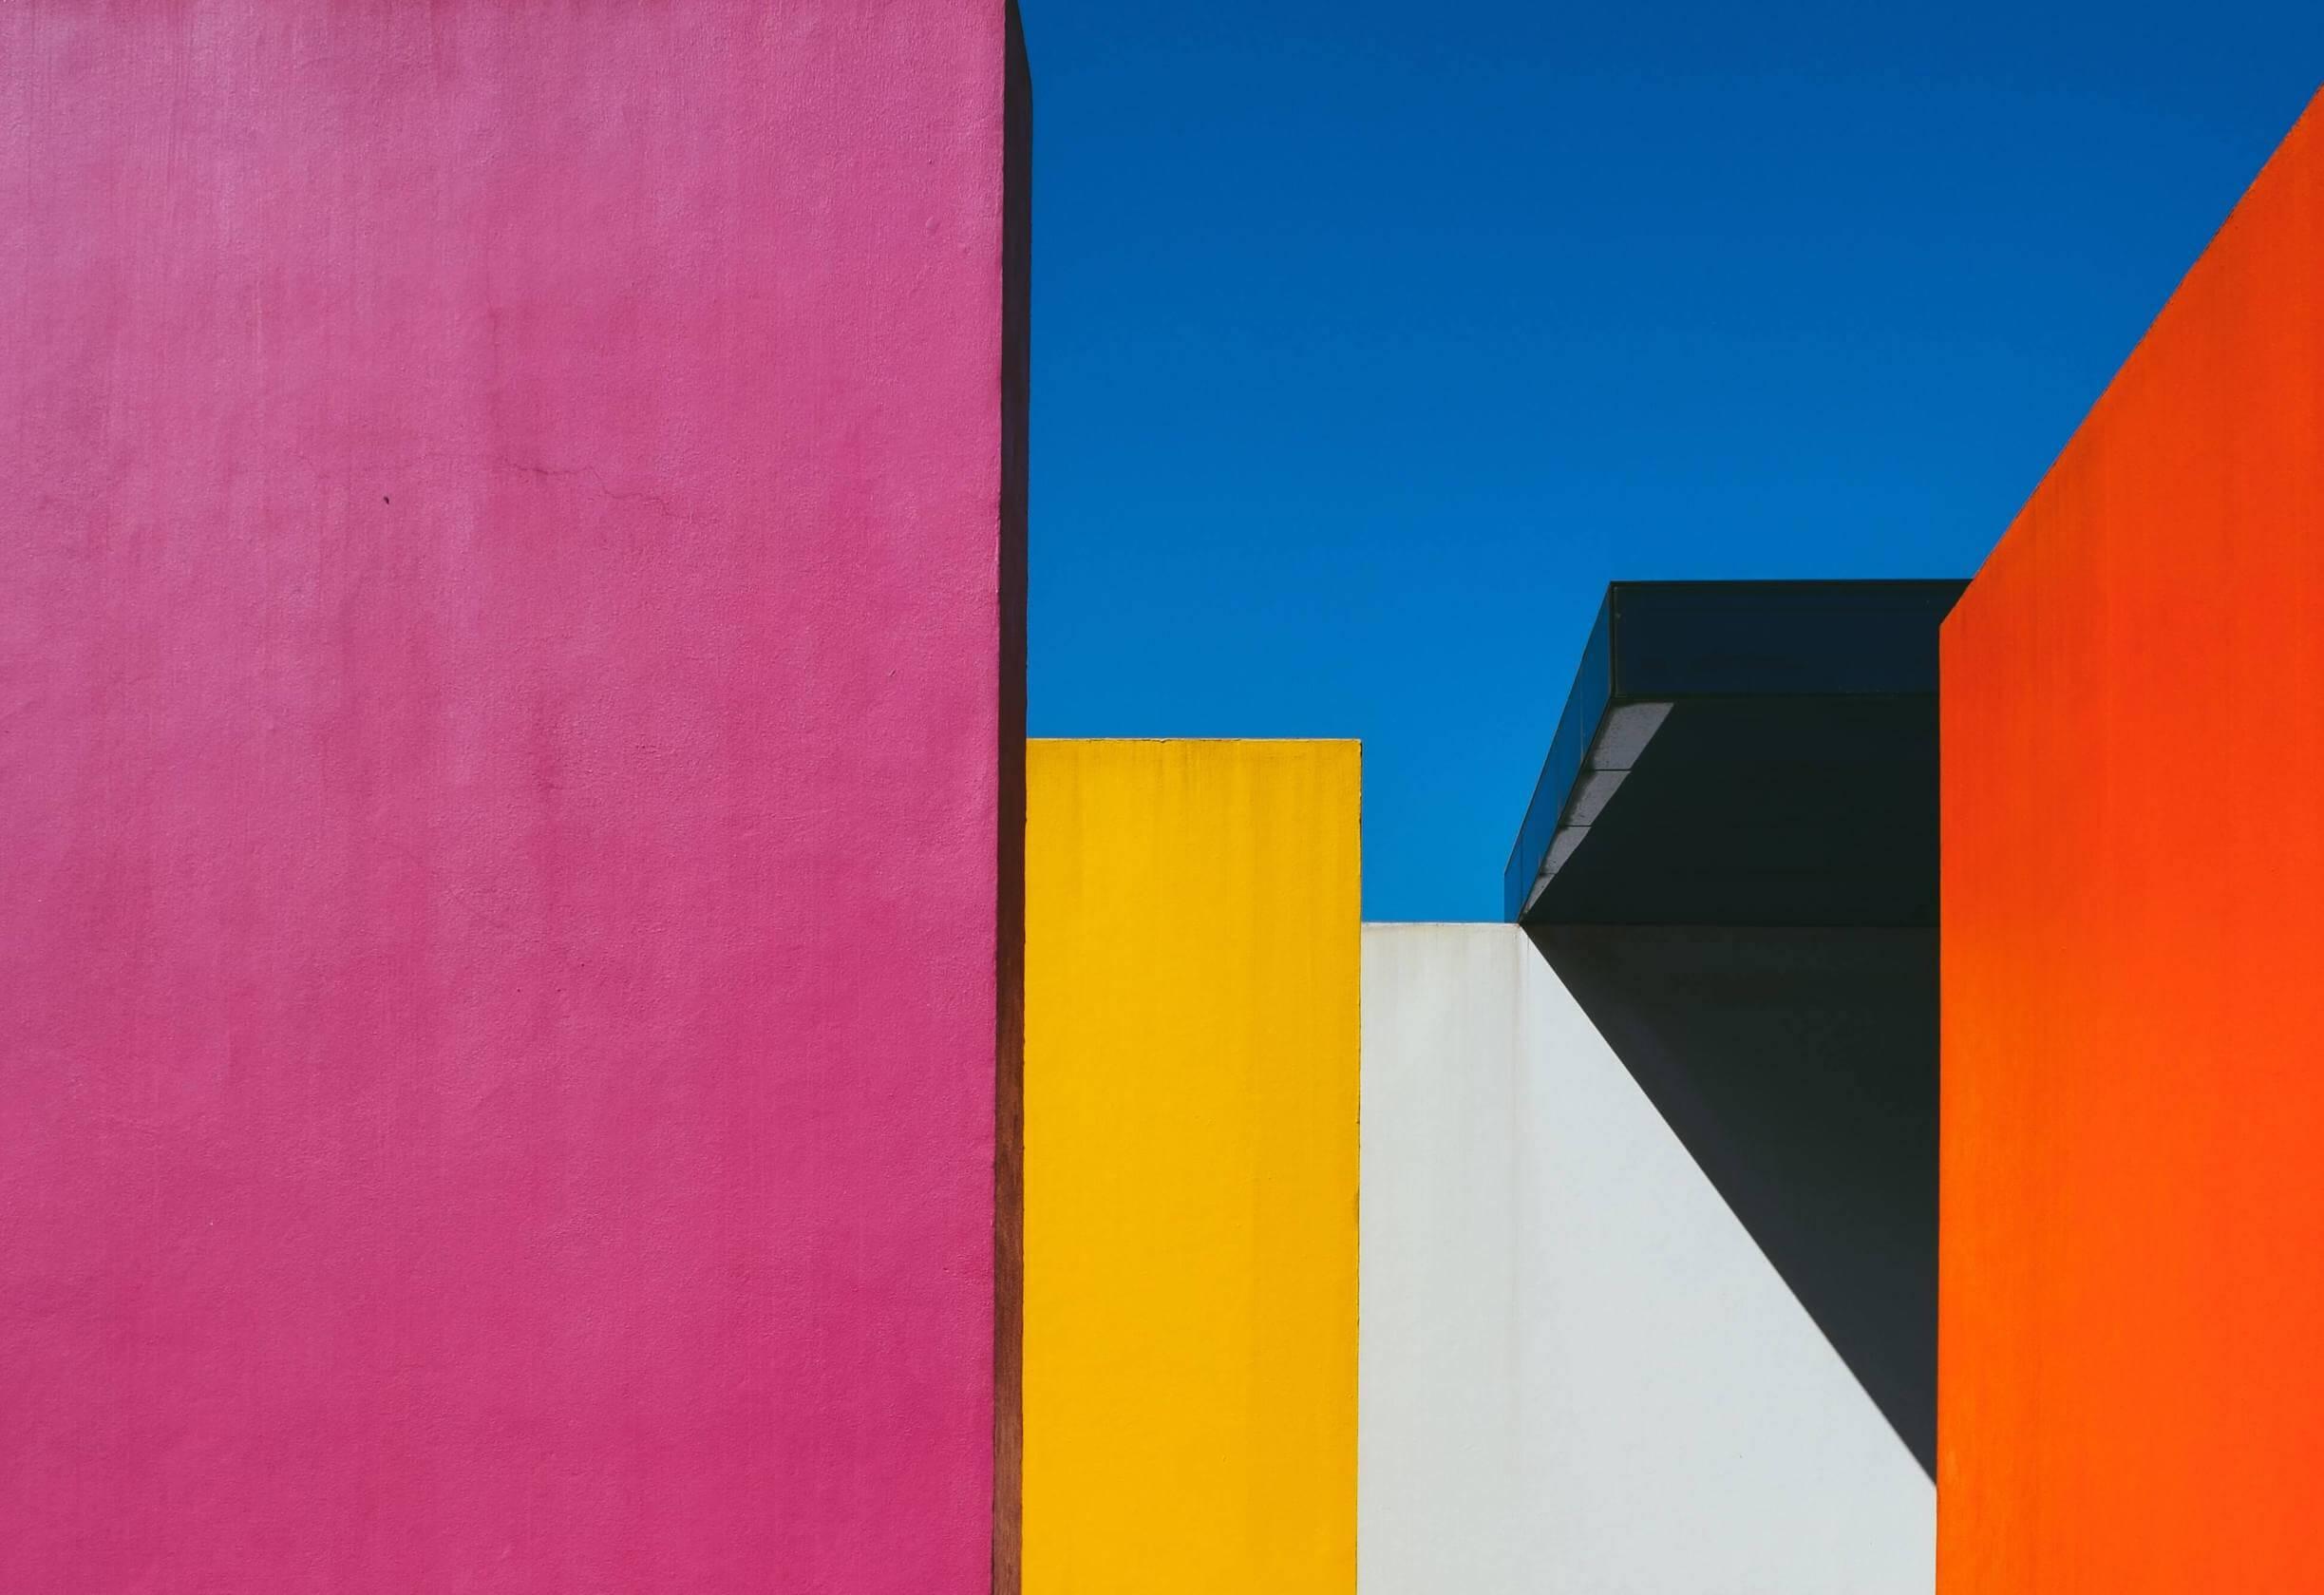 Colorful, modern buildings that evoke the art of Piet Mondrian set against a blue sky